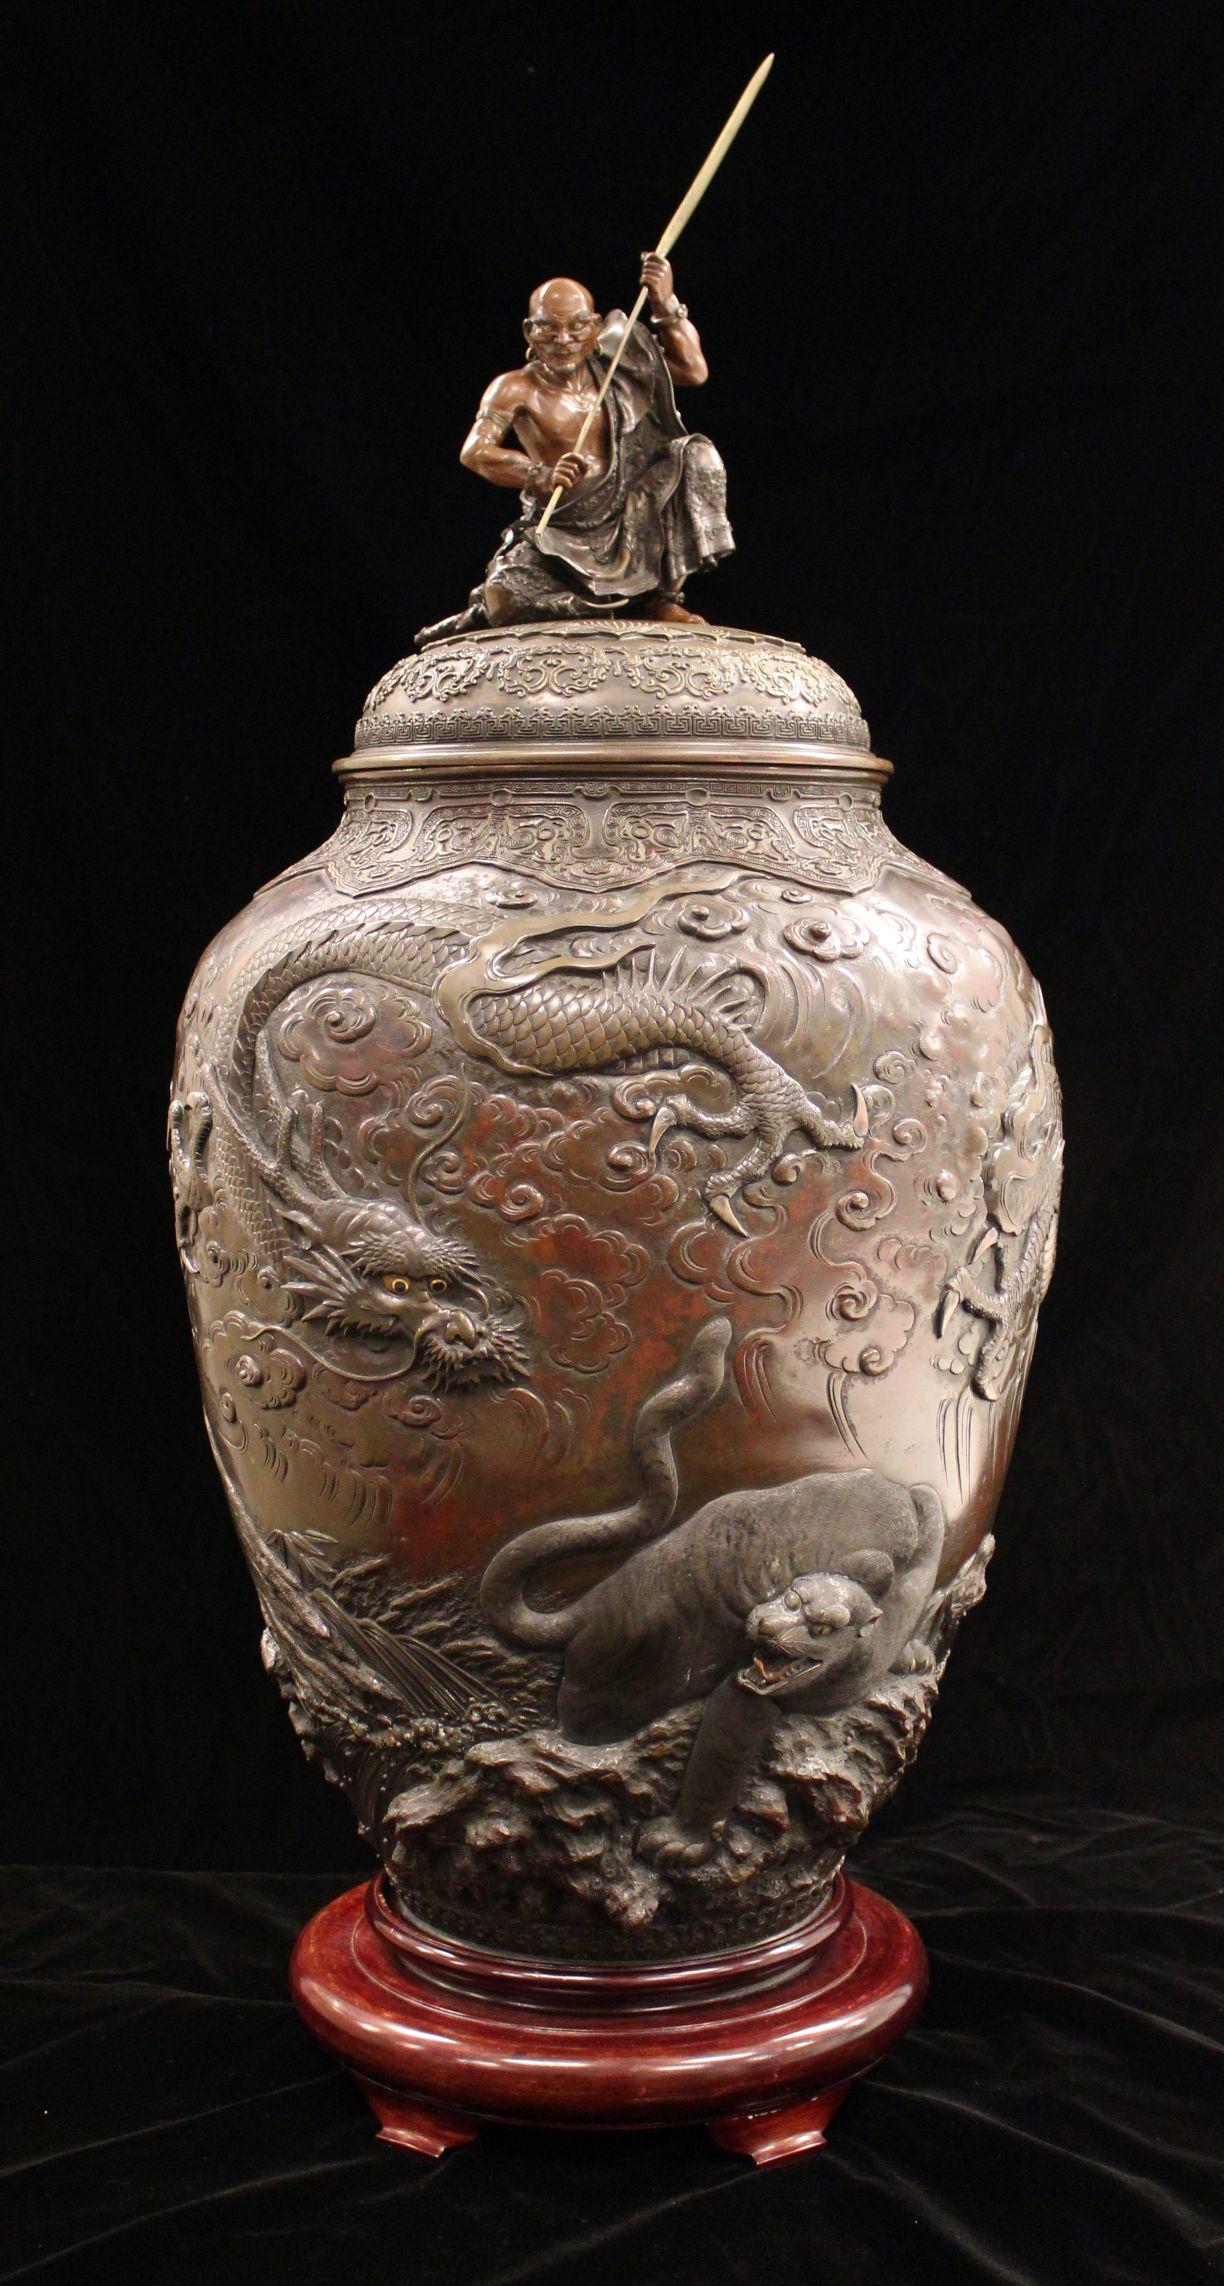 jar with dragon engravings